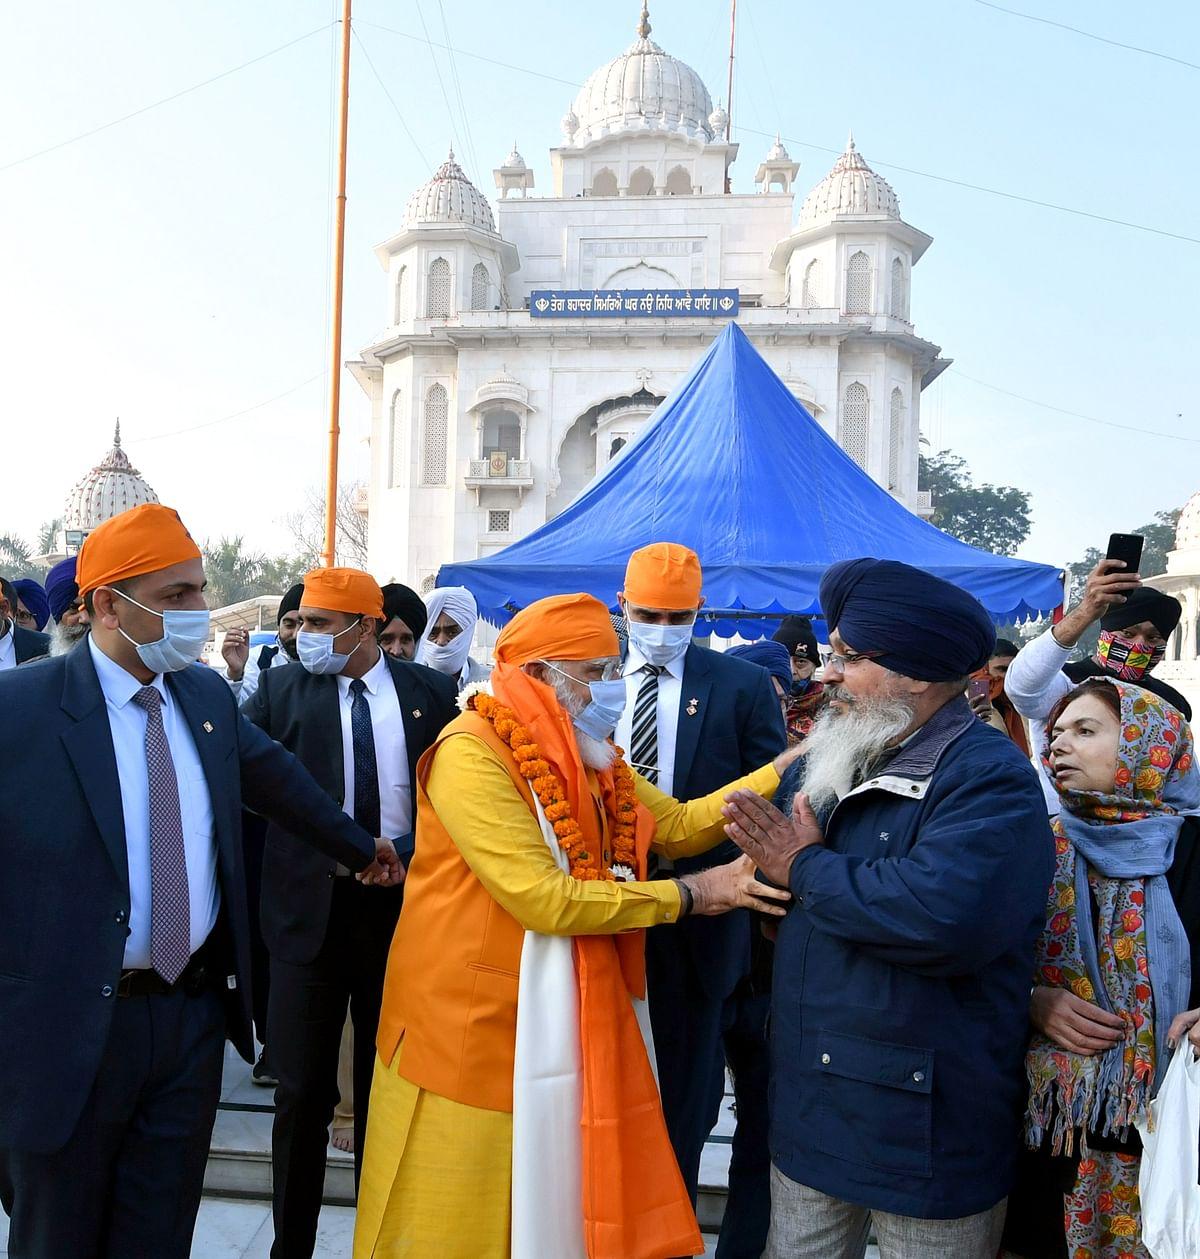 Prime Minister Narendra Modi meets people as he visits Gurudwara Rakab Ganj Sahib on the occasion of the 400th Prakash Parv of Guru Teg Bahadur, in New Delhi on Sunday